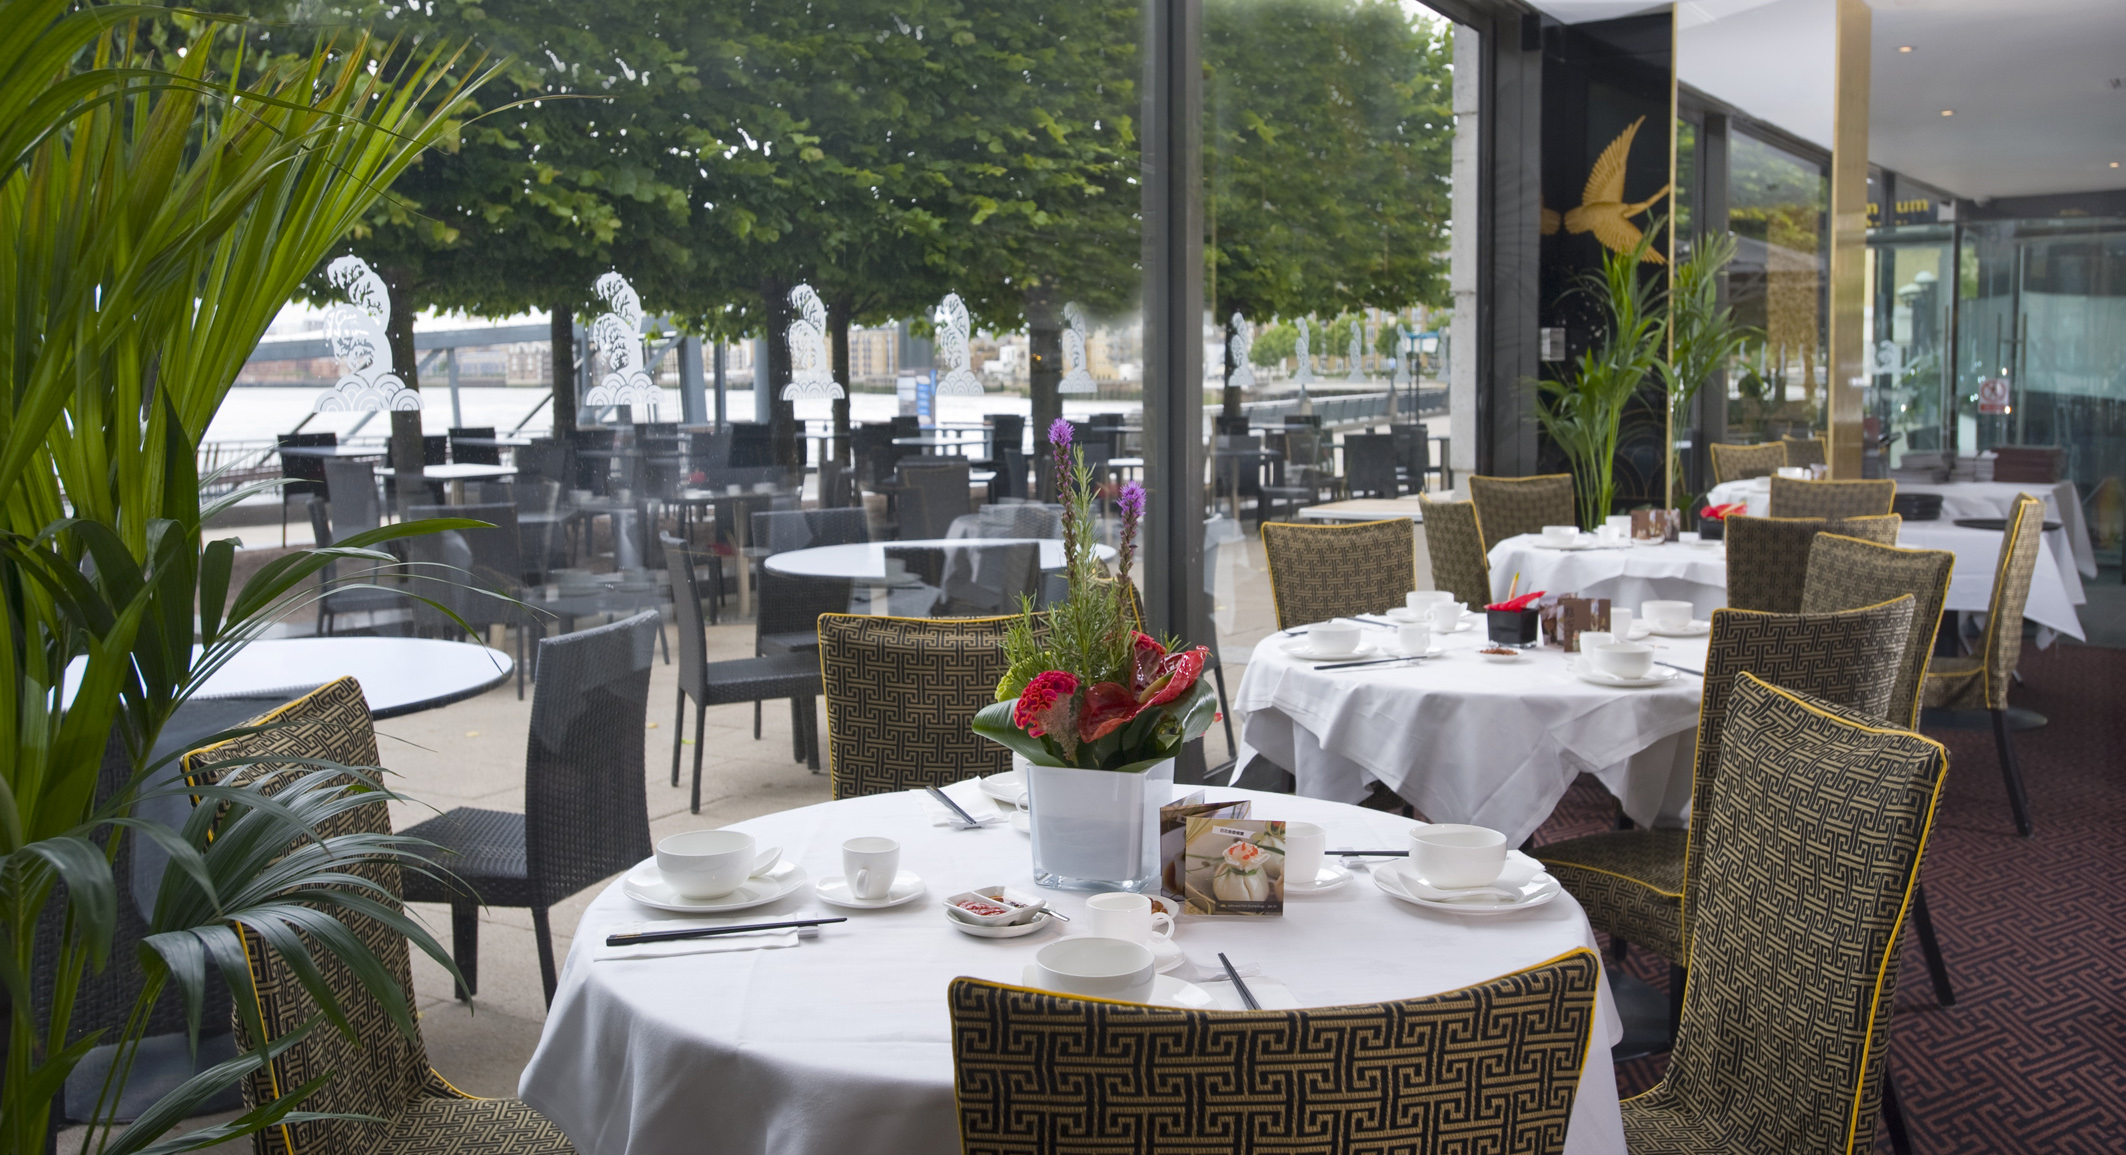 1. Royal China Canary Wharf and Outside Terrace.jpg